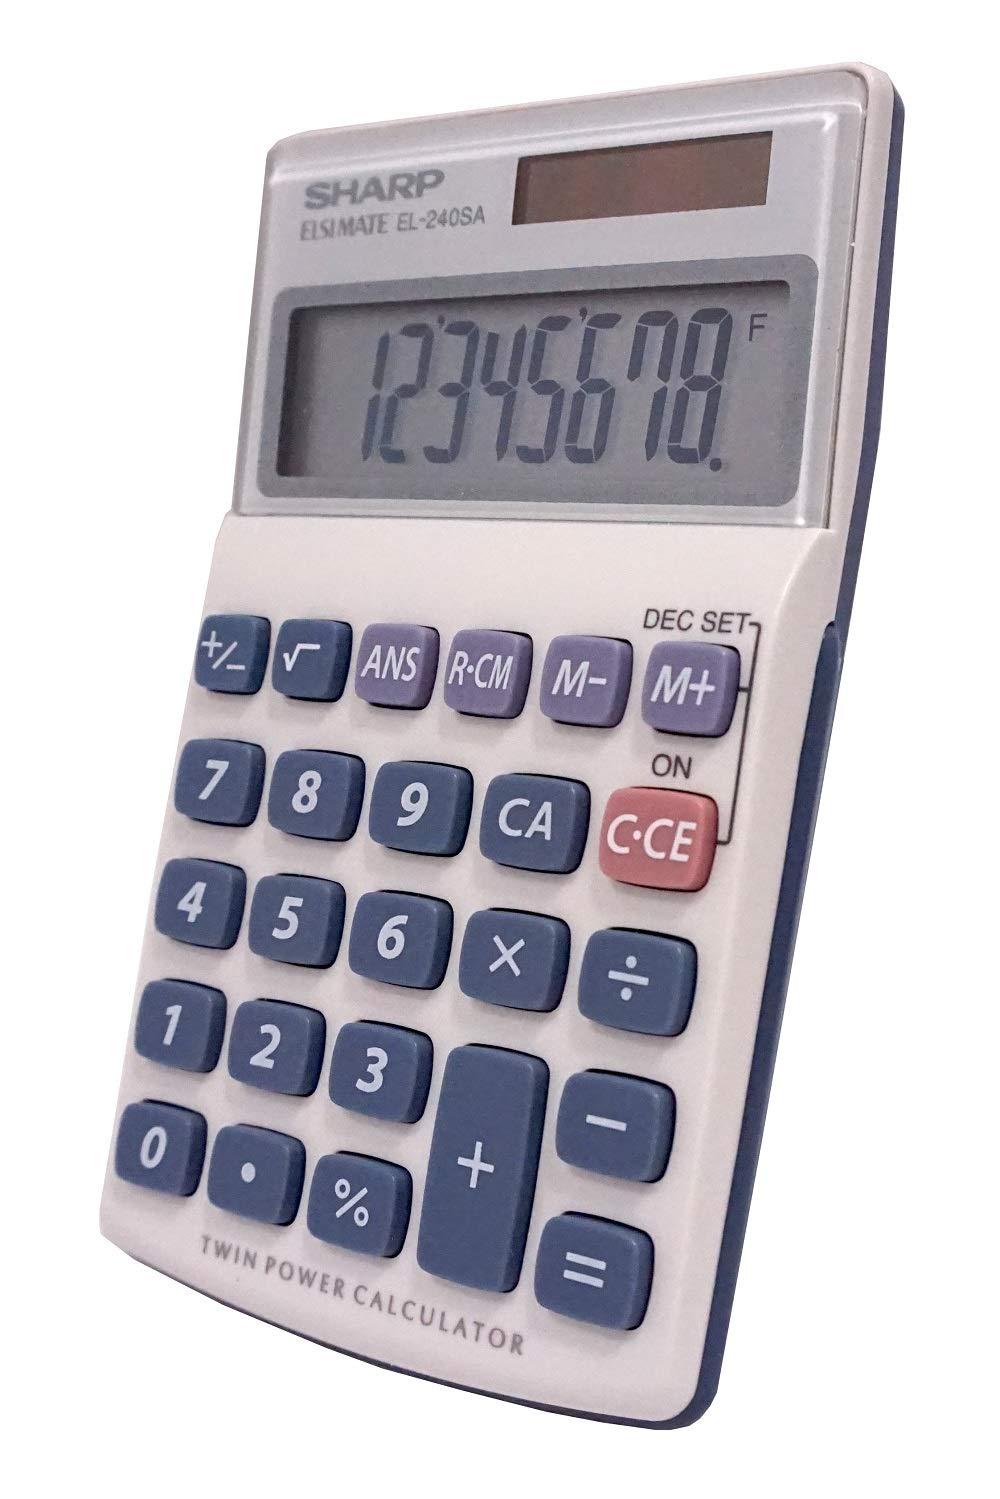 b4b04b677a Amazon.com : Sharp HO EL240SB 8 Digit Solar and Battery Powered Slant  Display Calculator : Solar Calculator Large Keys : Electronics